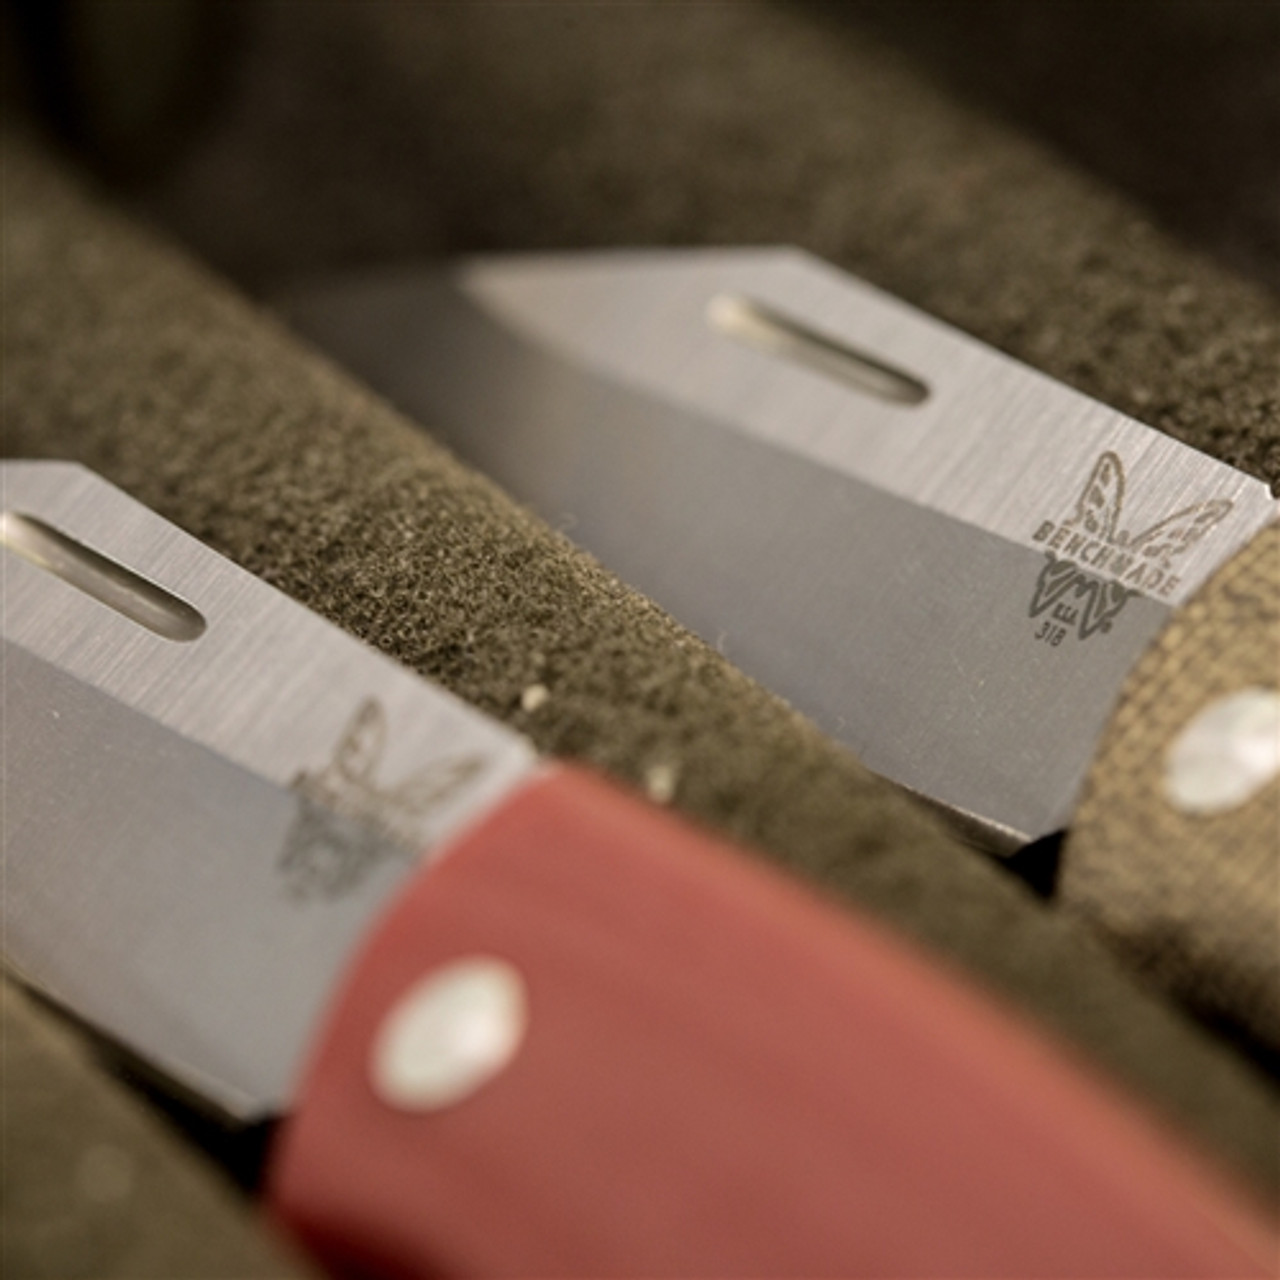 Benchmade 318-1 Dark Red Proper Clip Point Non-Locking Folder Knife, CPM-S30V Satin Blade